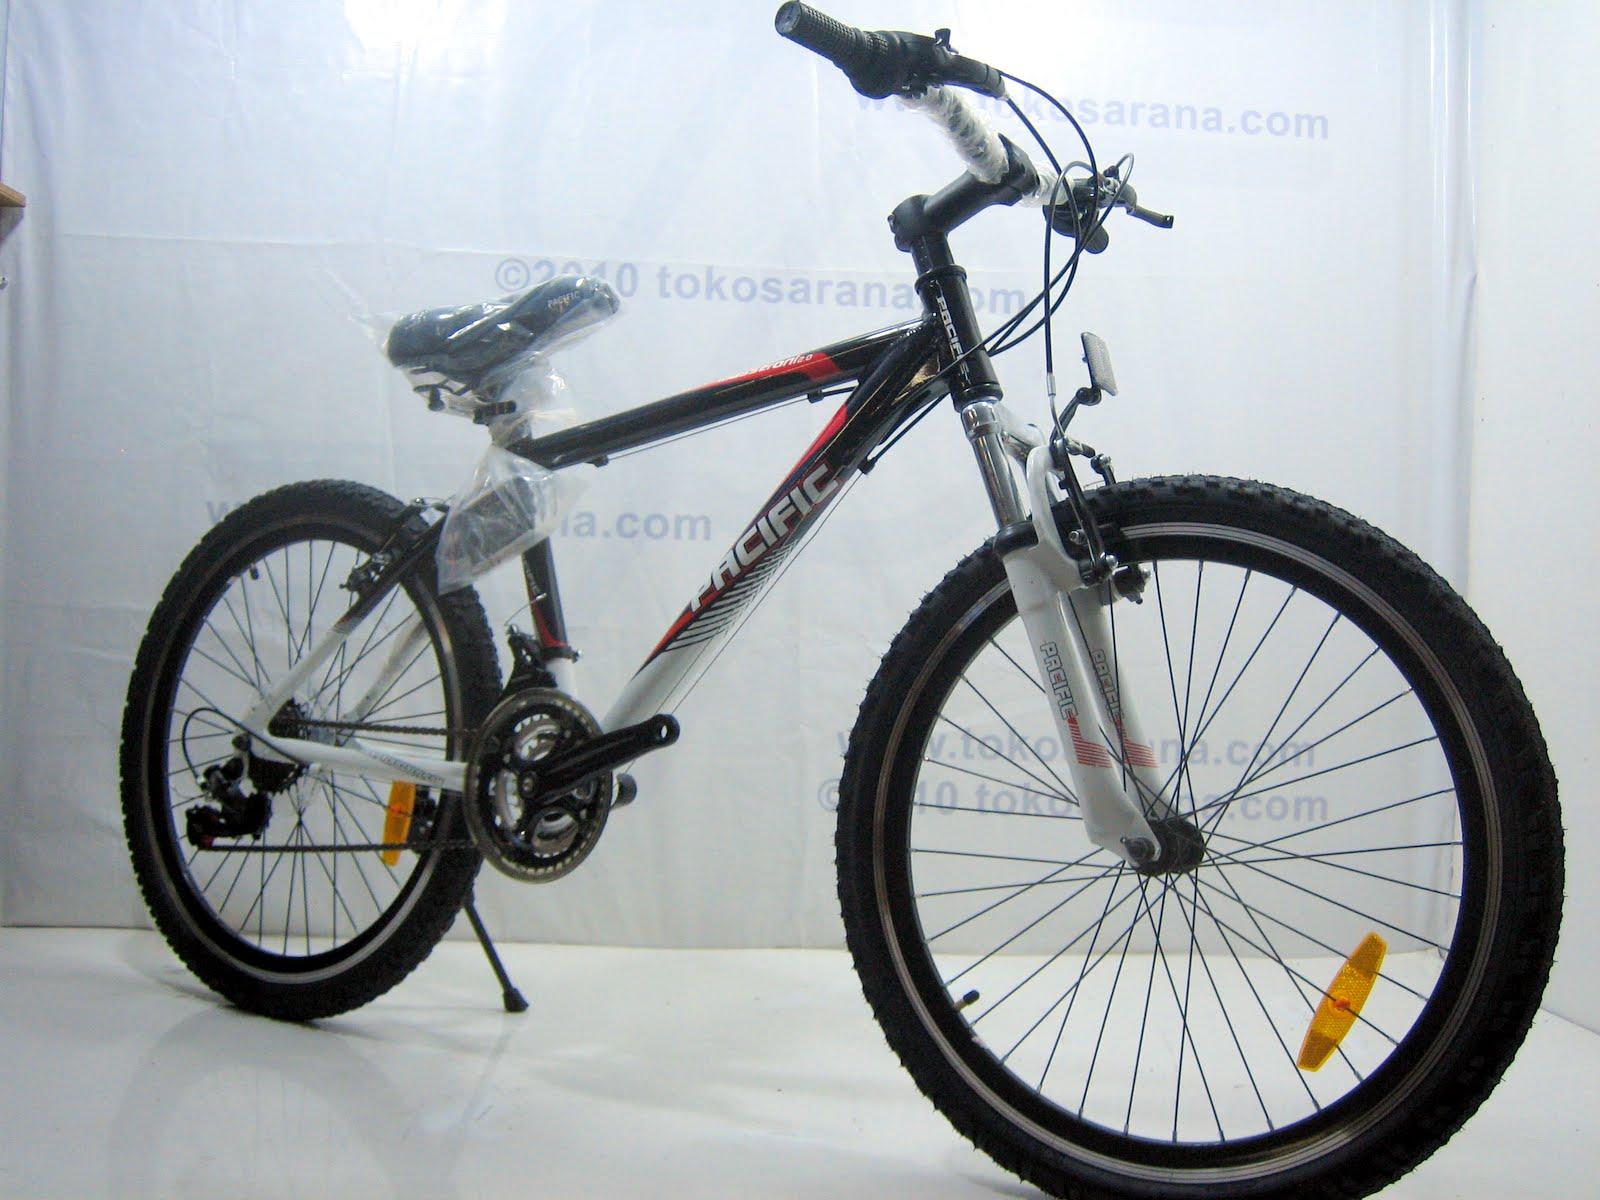 Shopping Blog tokosarana® - Jakarta (021)8517179